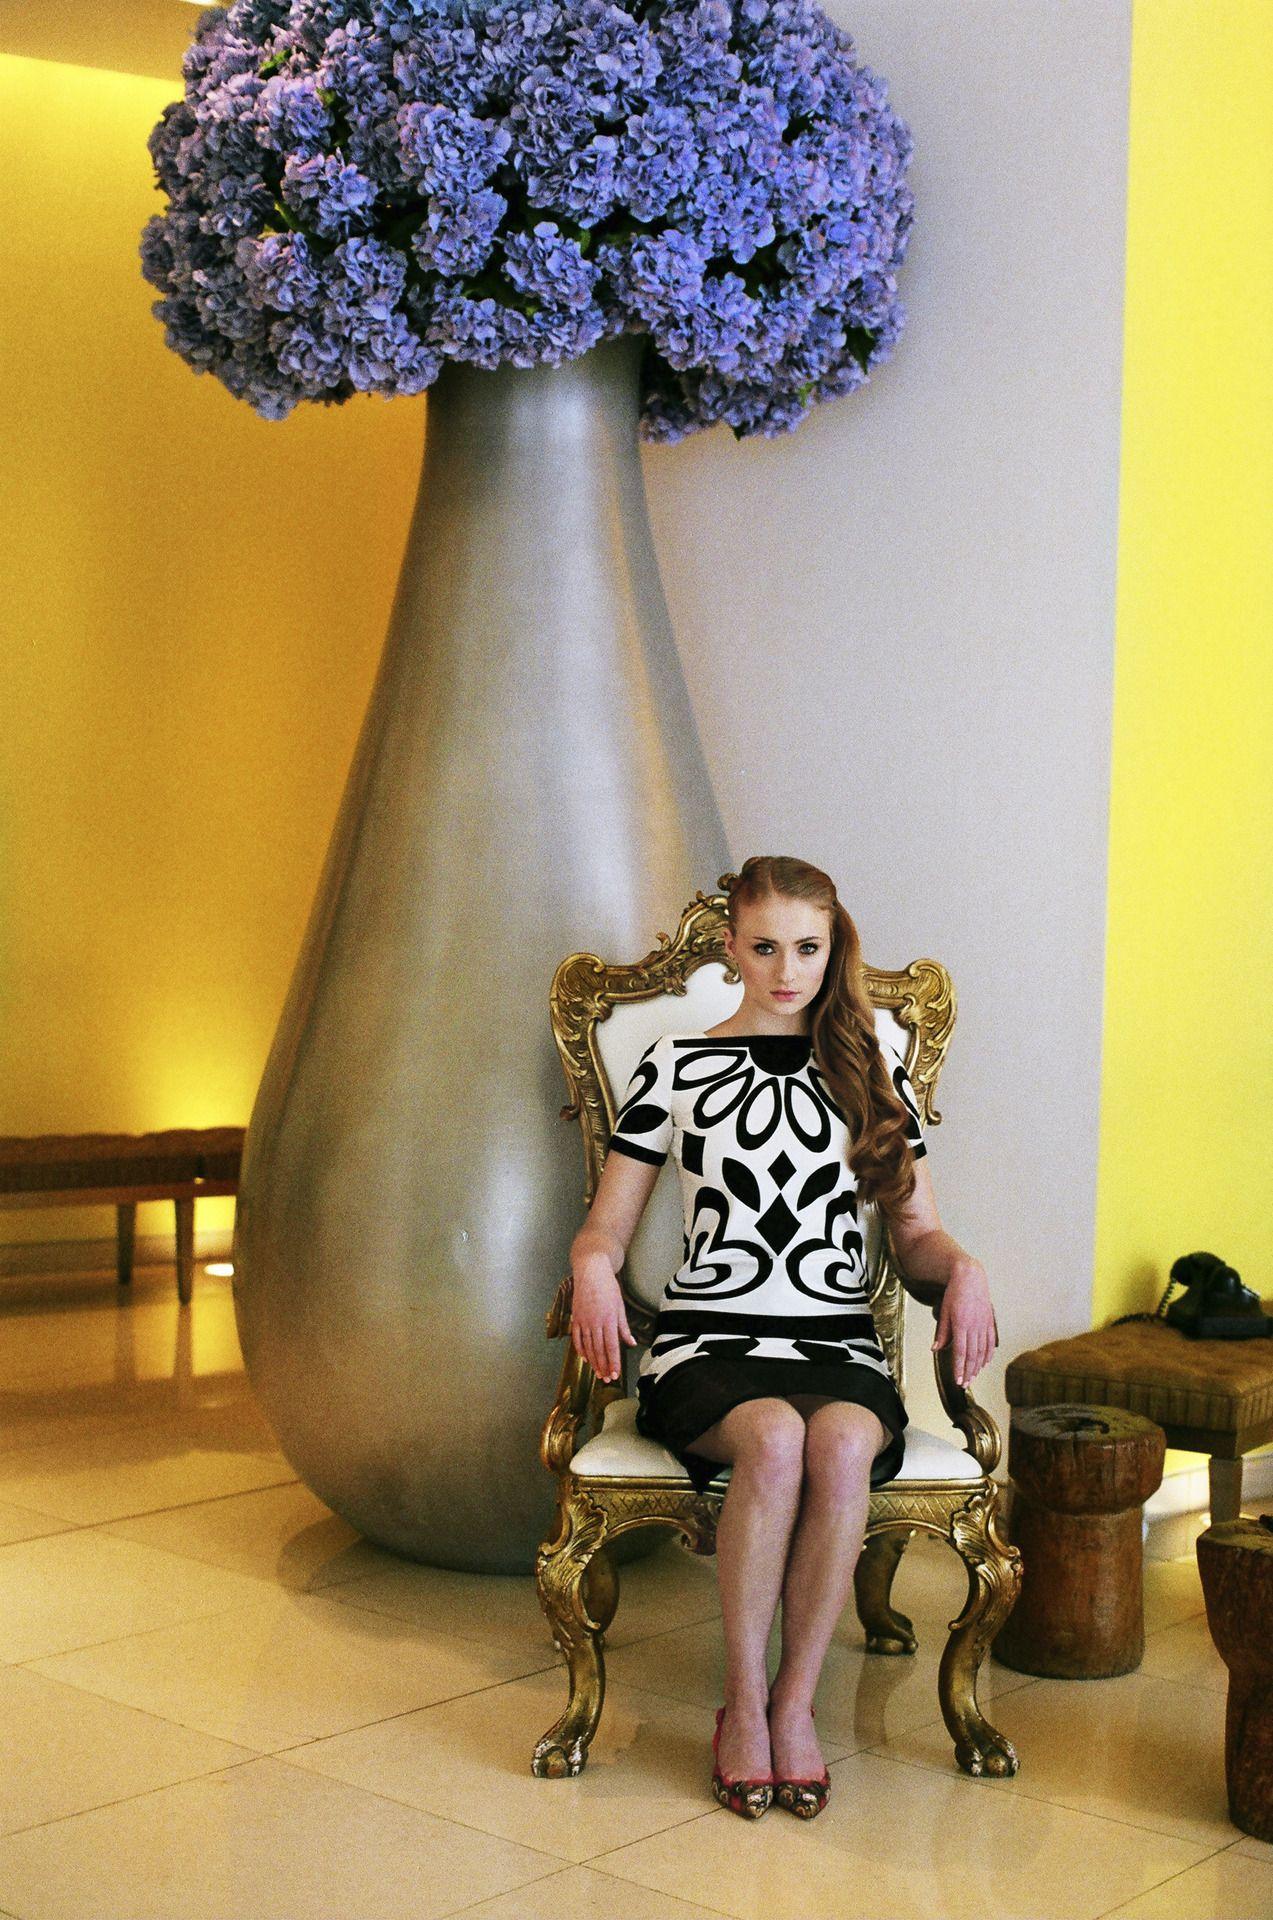 Game of Throne's Sophie Turner for 1883 Magazine / June 2013 photography /Alena Jascanka fashion /Chad Burton